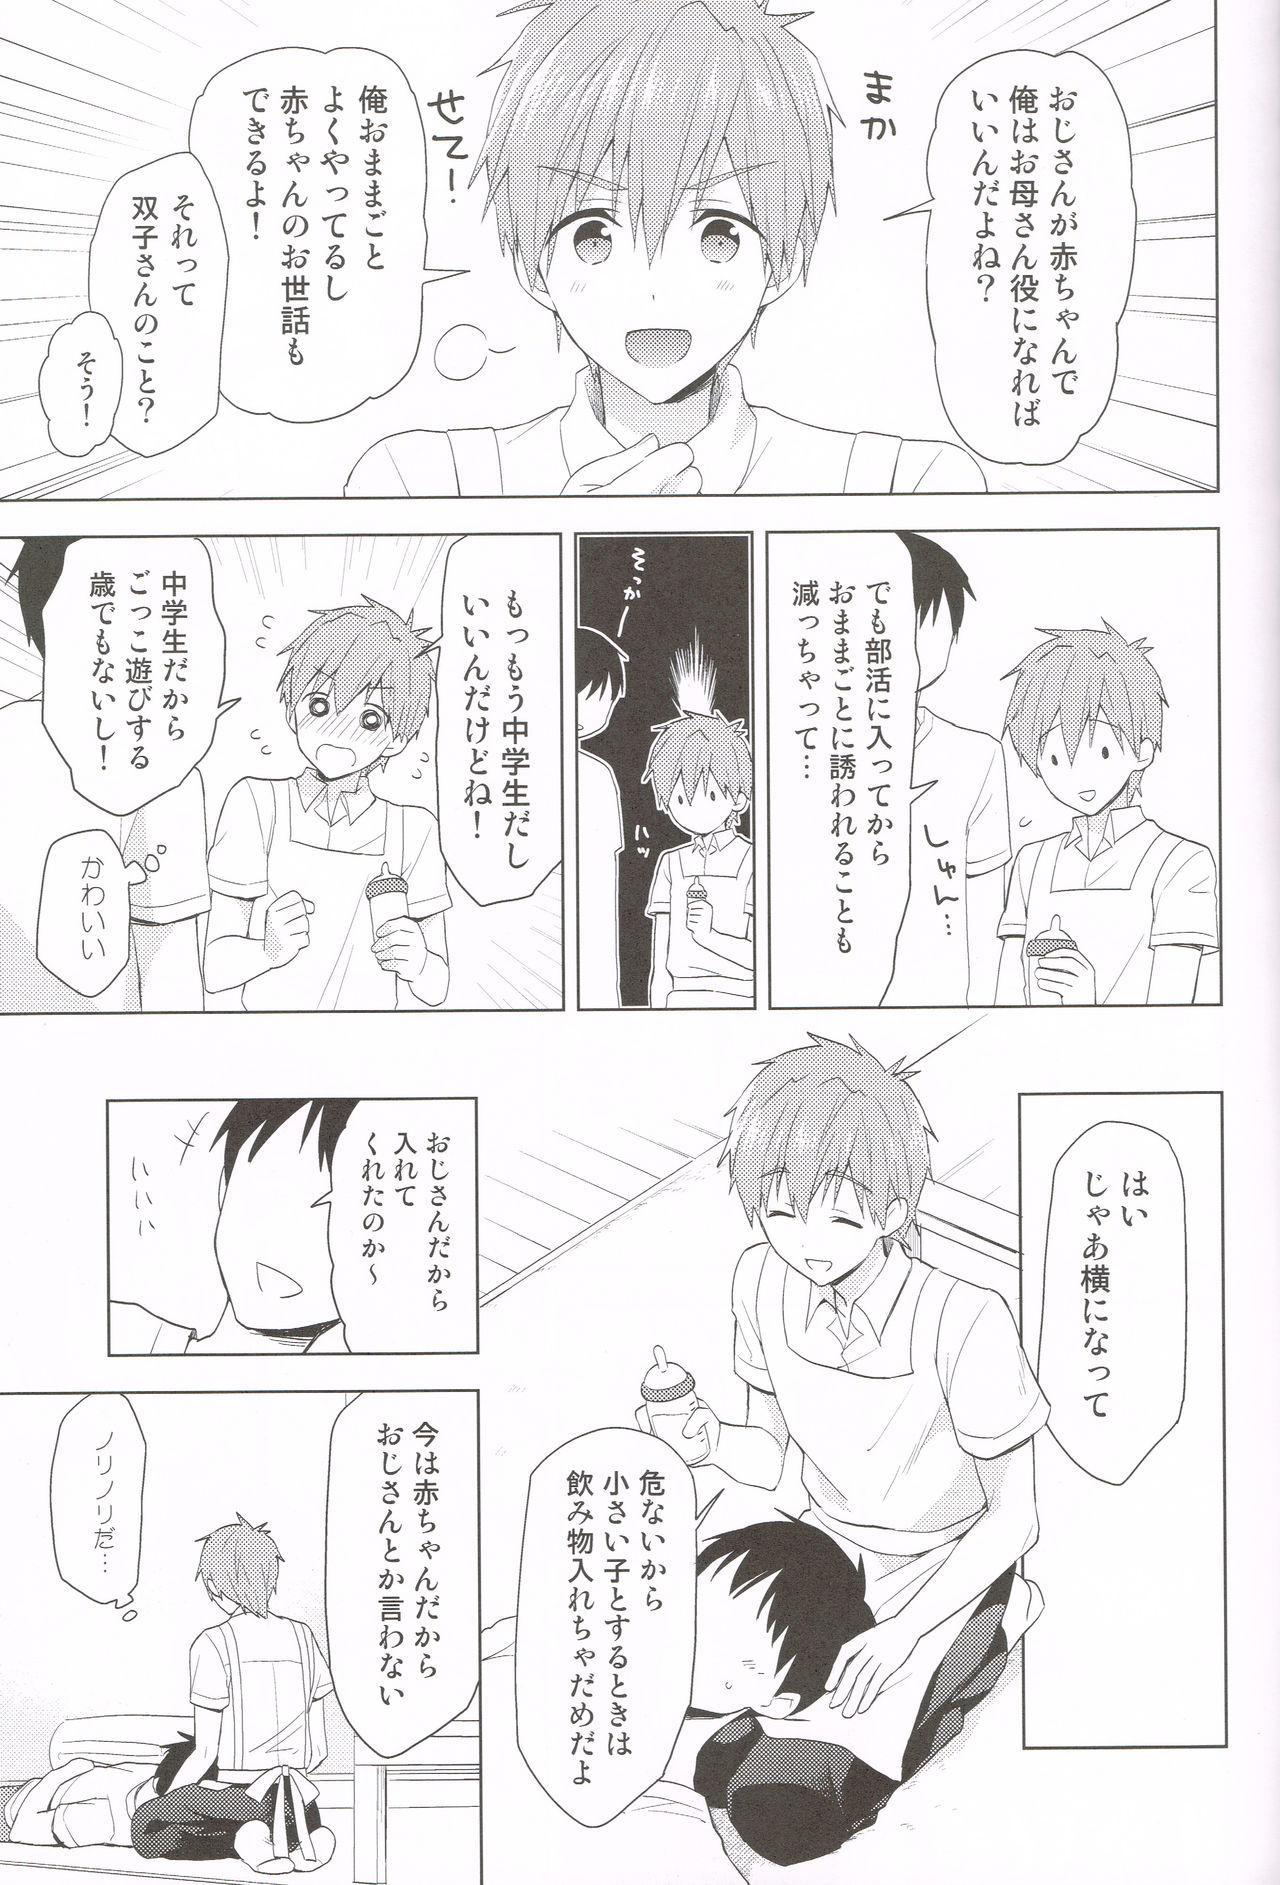 Makoto-kun to Omamagoto 5